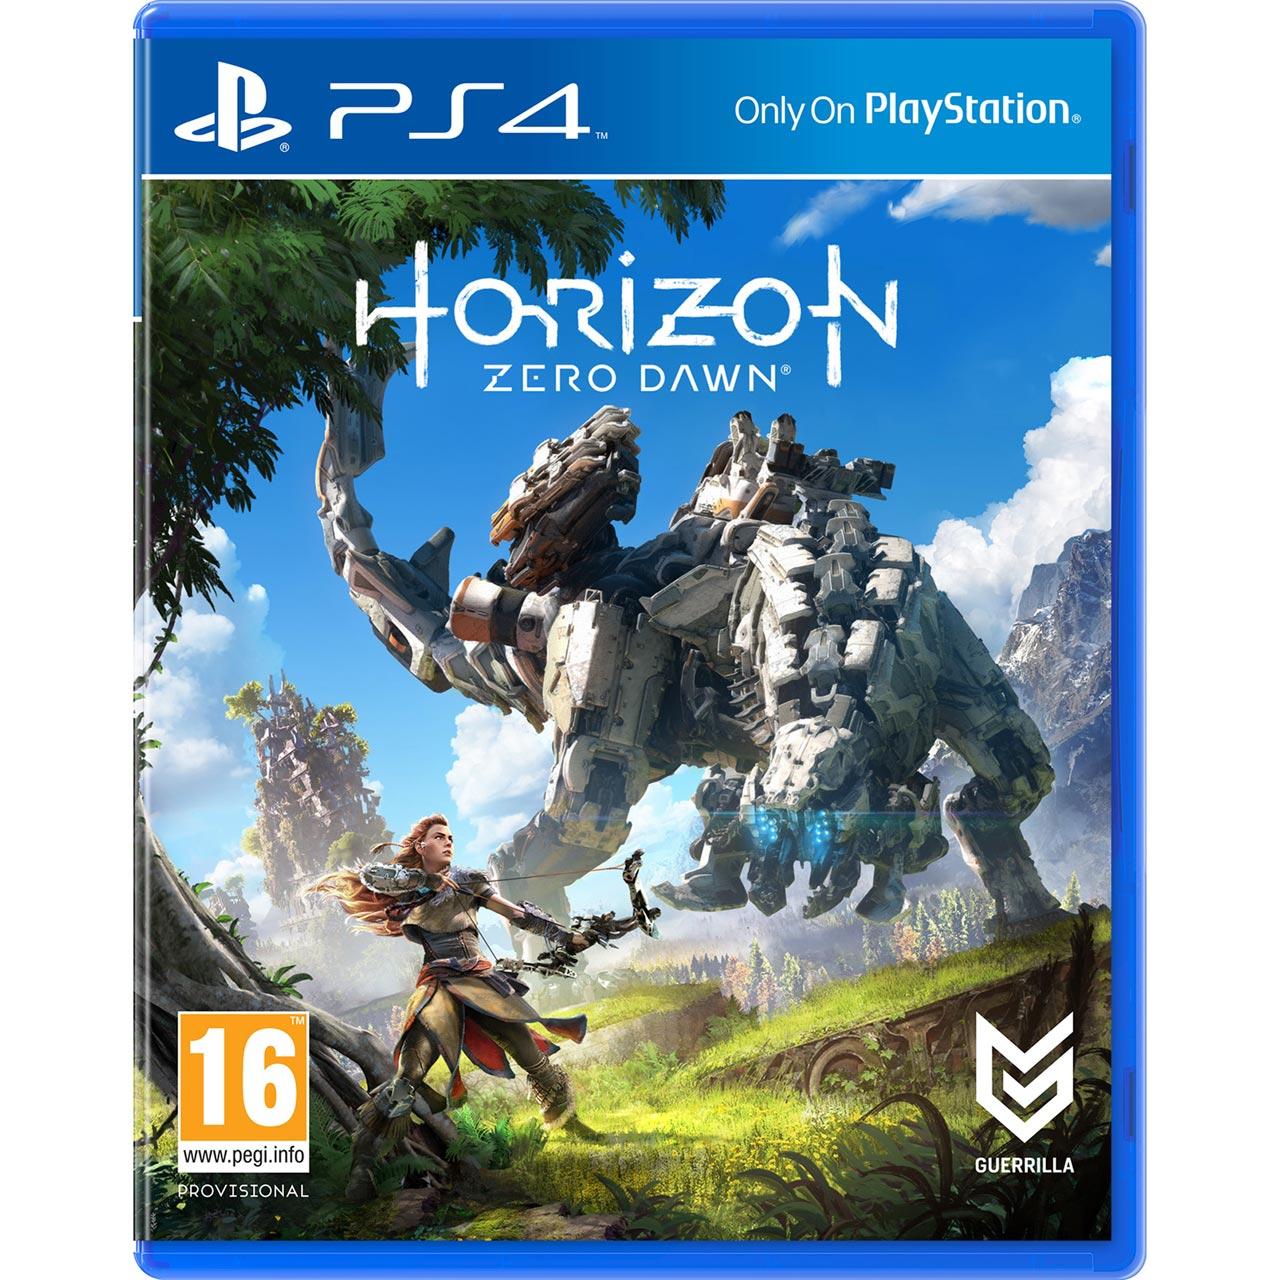 Horizon Zero Dawn (PS4) for £15 delivered @ AO.com